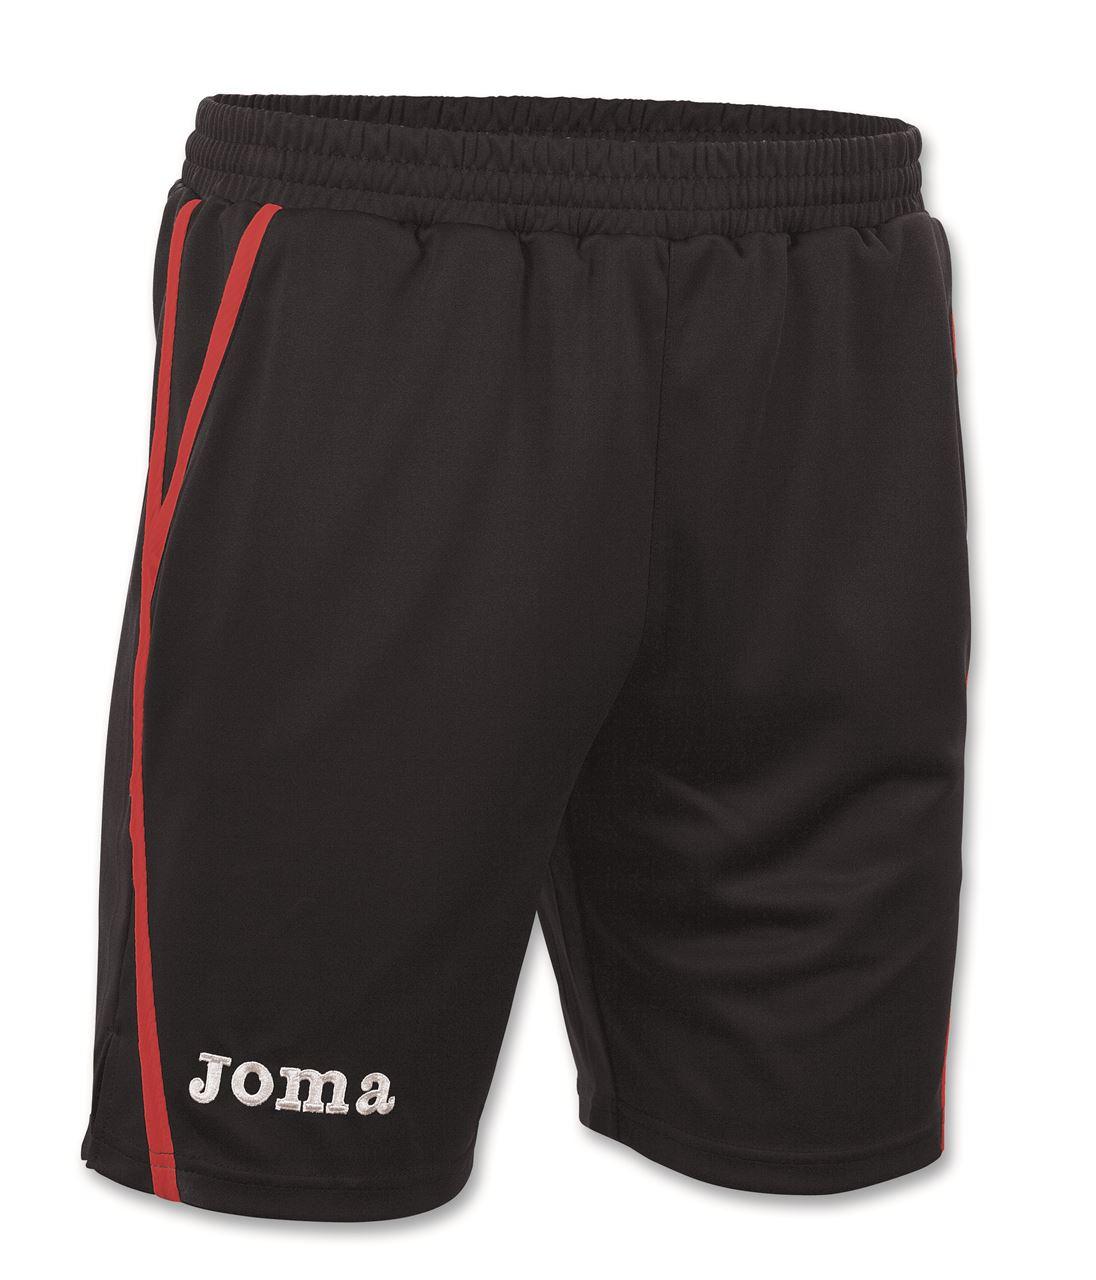 Joma Combi Junior Bermuda 2006.13